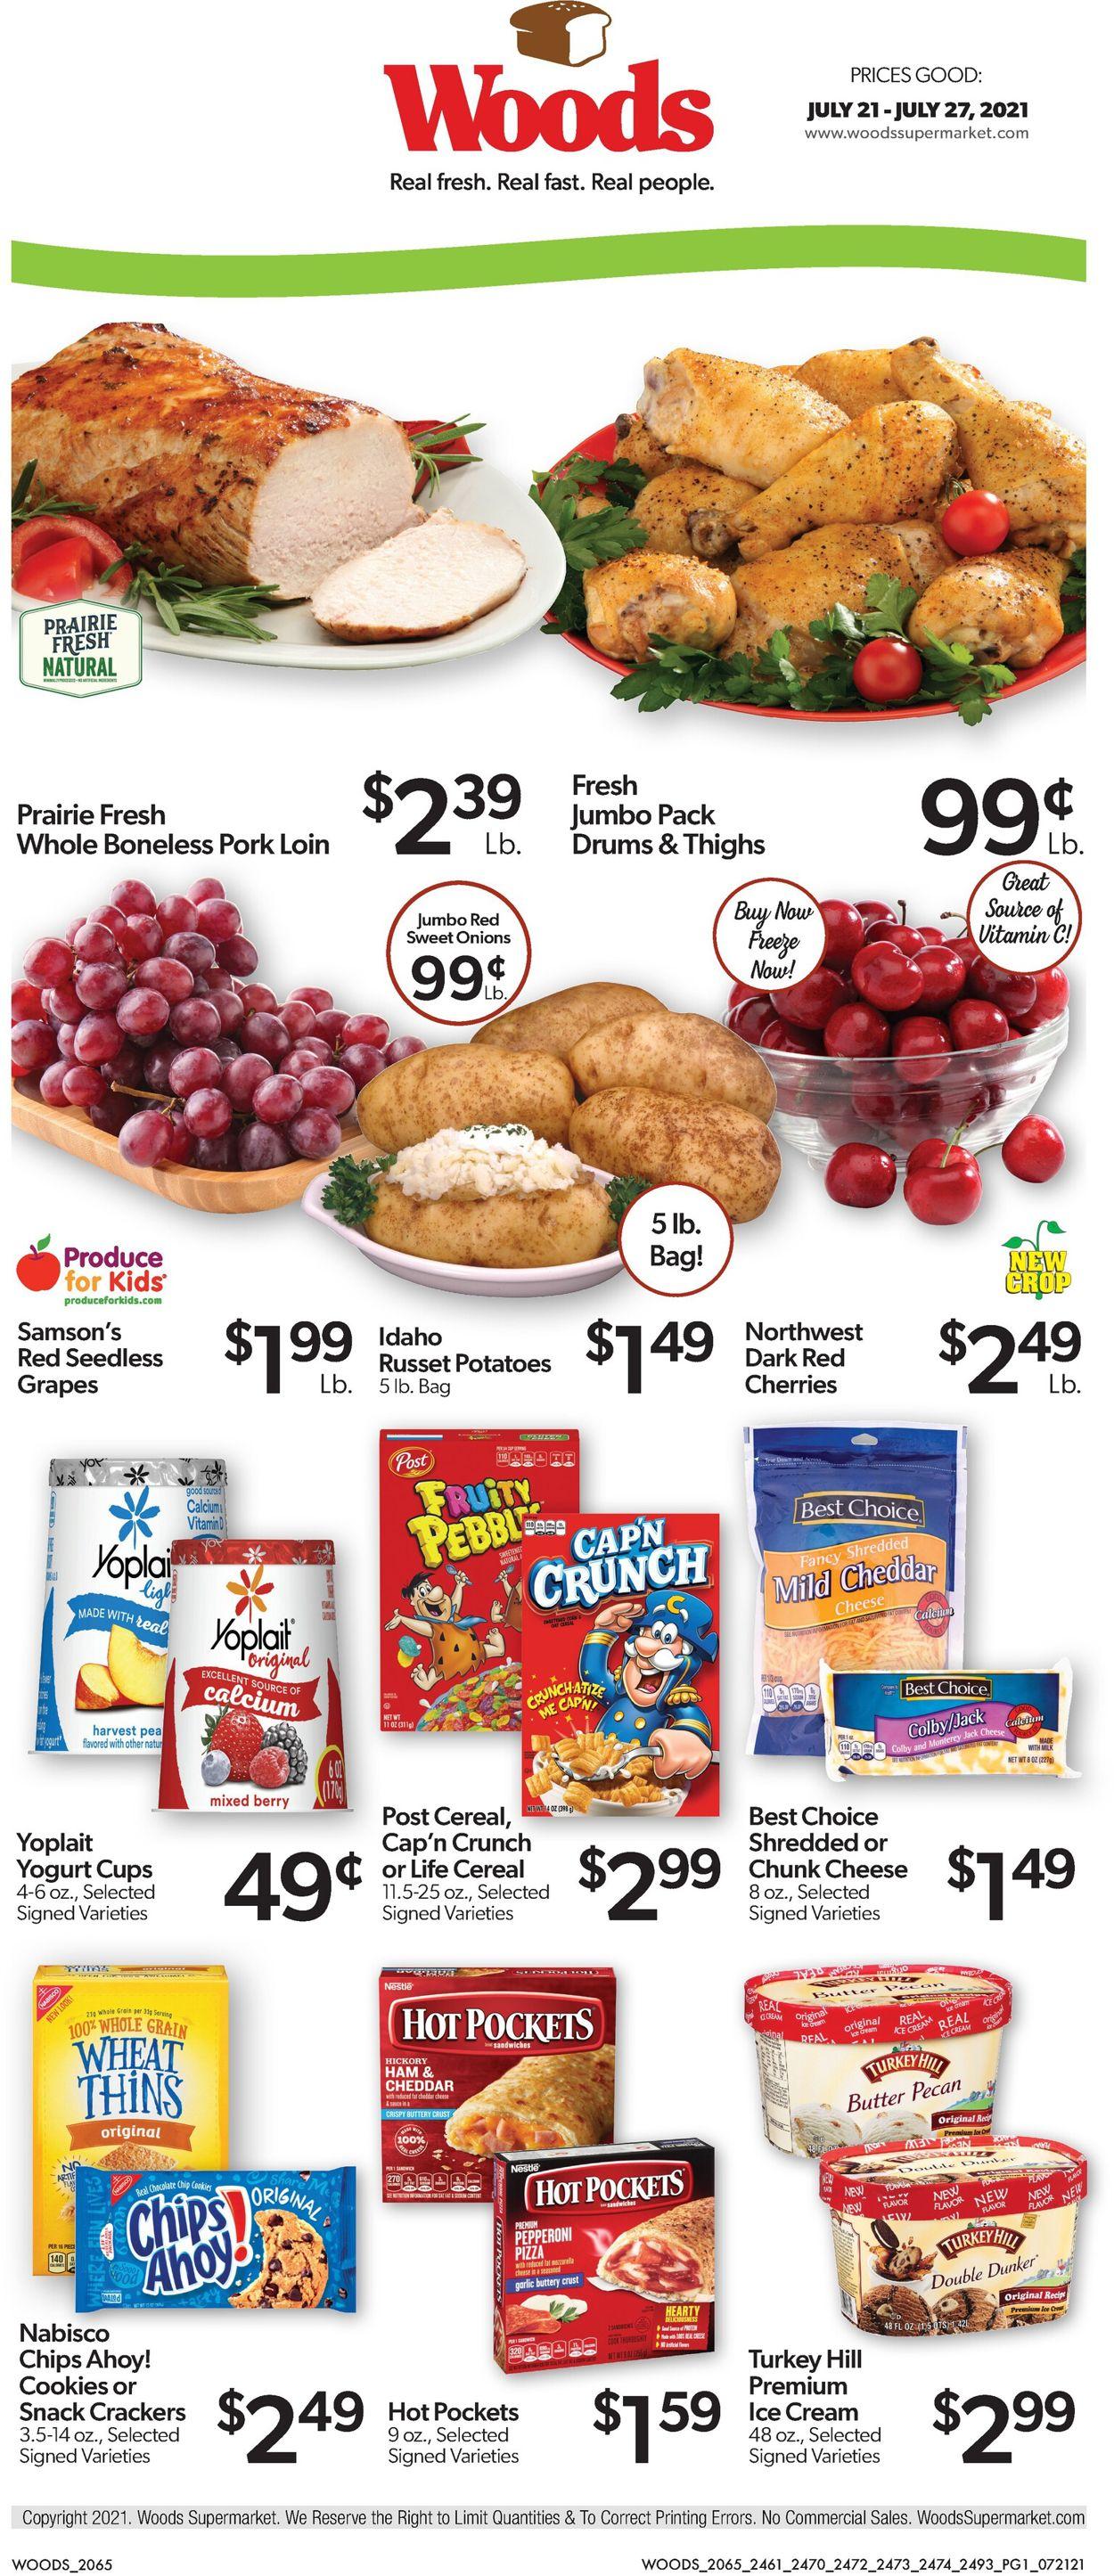 Woods Supermarket Weekly Ad Circular - valid 07/21-07/27/2021